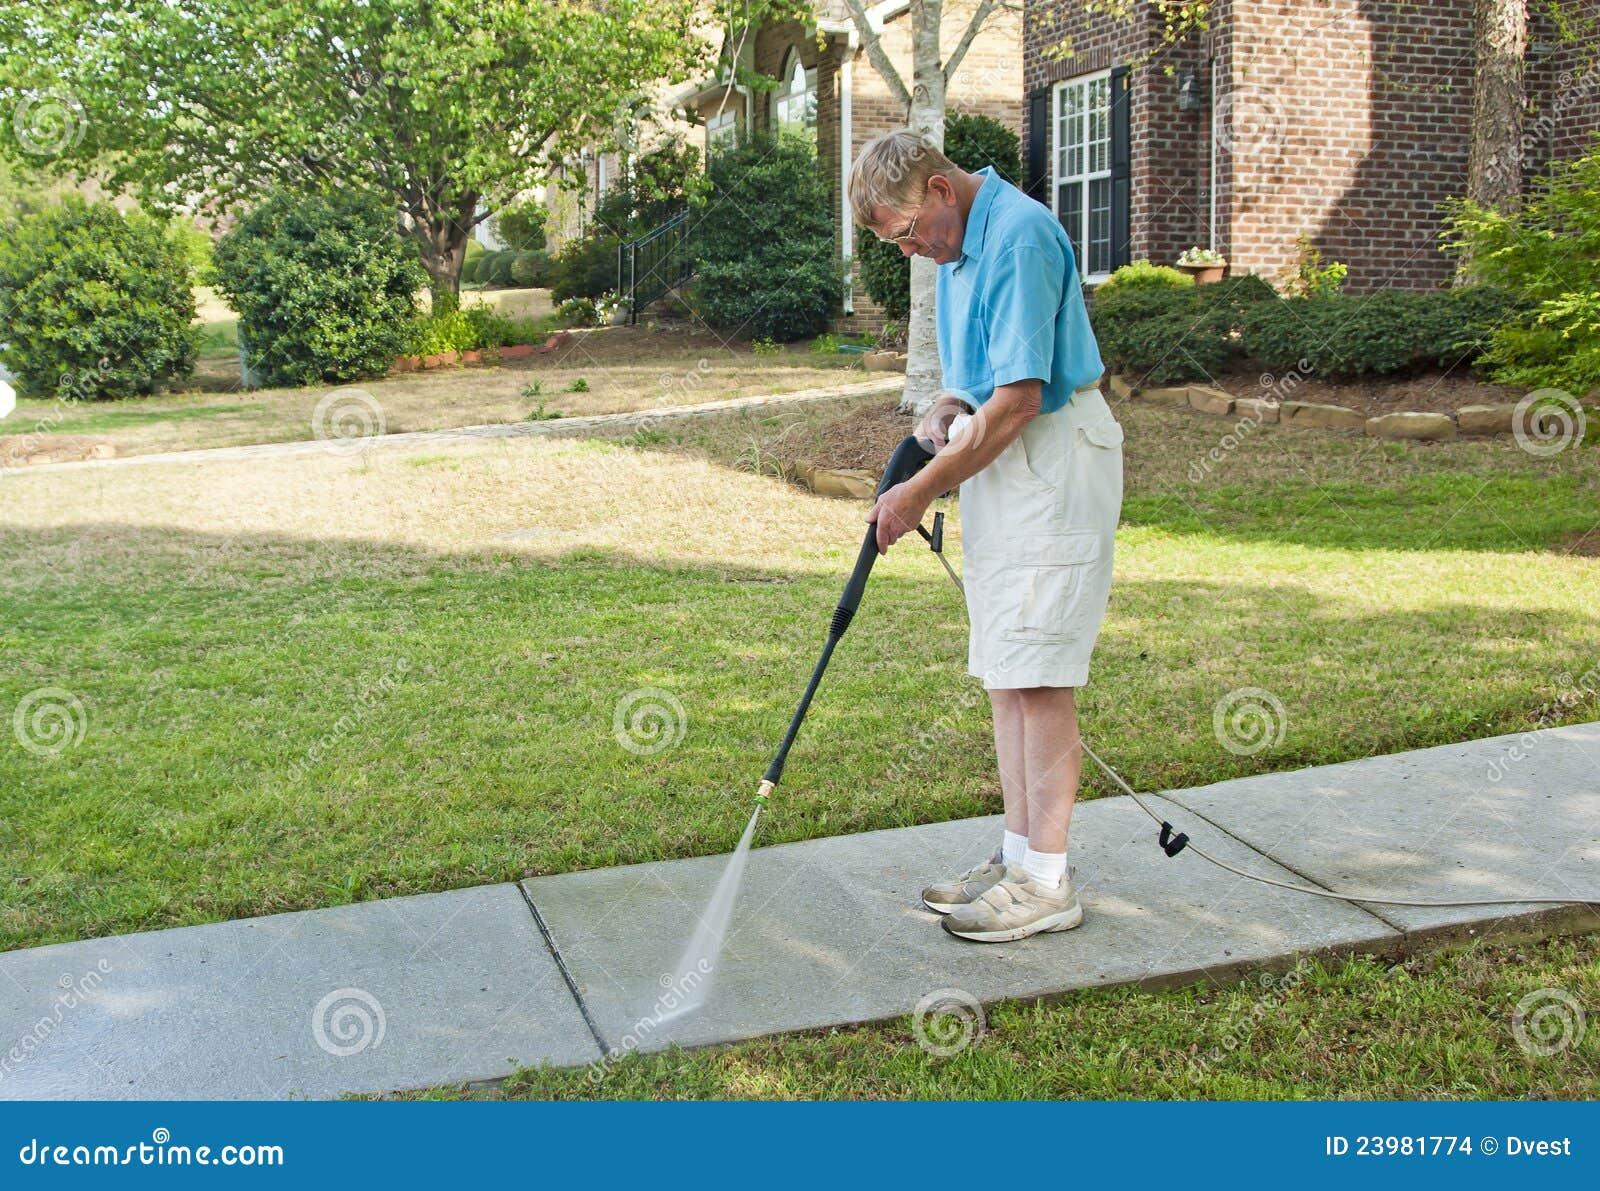 Male Pressure Washing Sidewalk Royalty Free Stock Photo